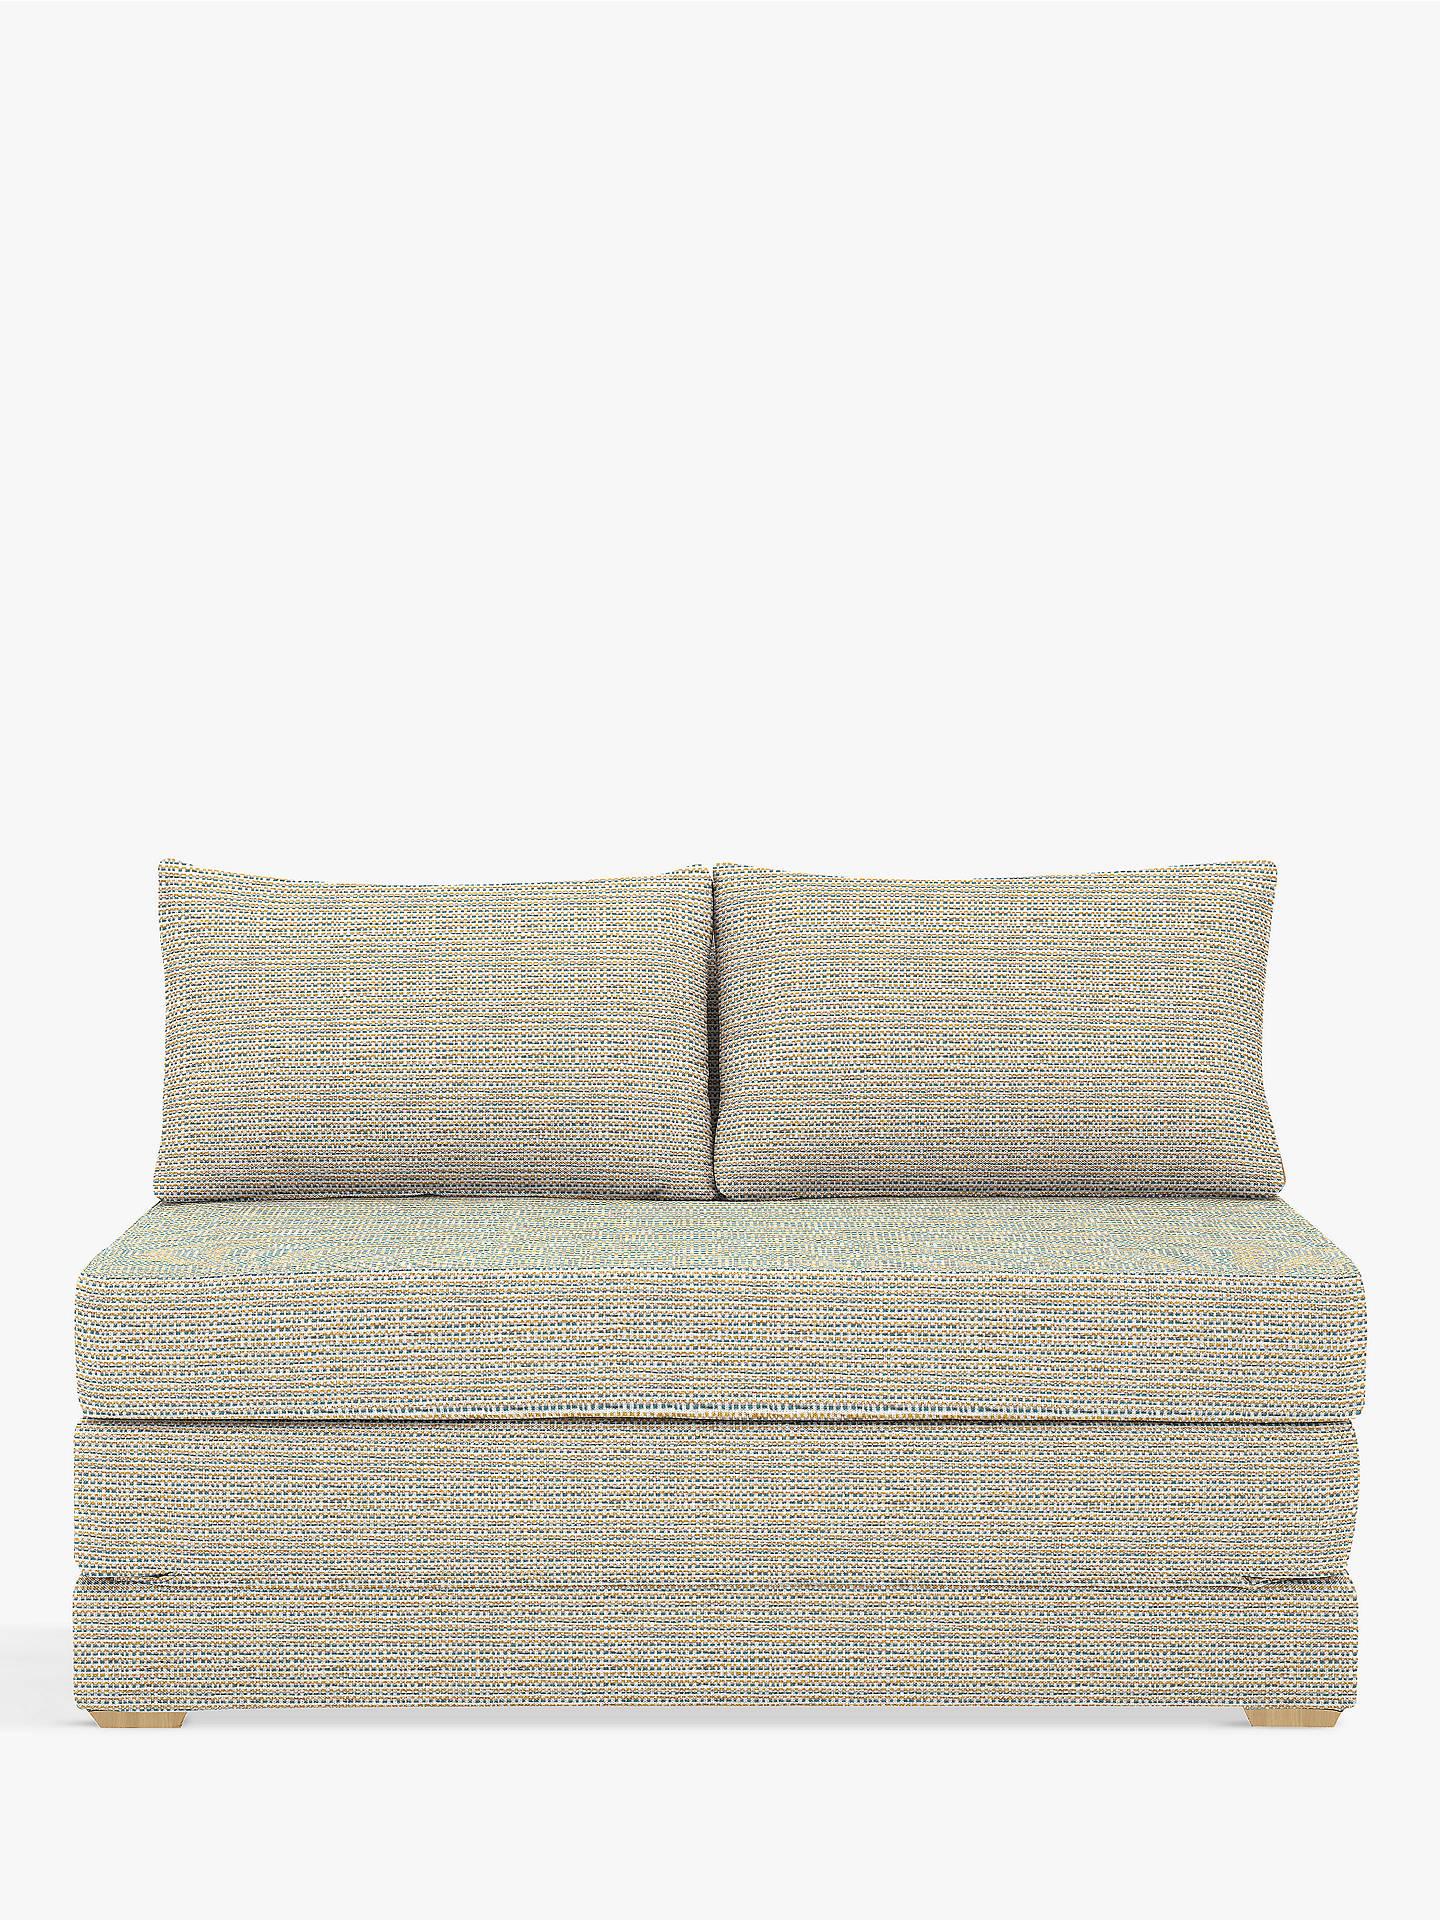 John Lewis Kip Small Sofa Bed With Foam Mattress Light Leg Kyla